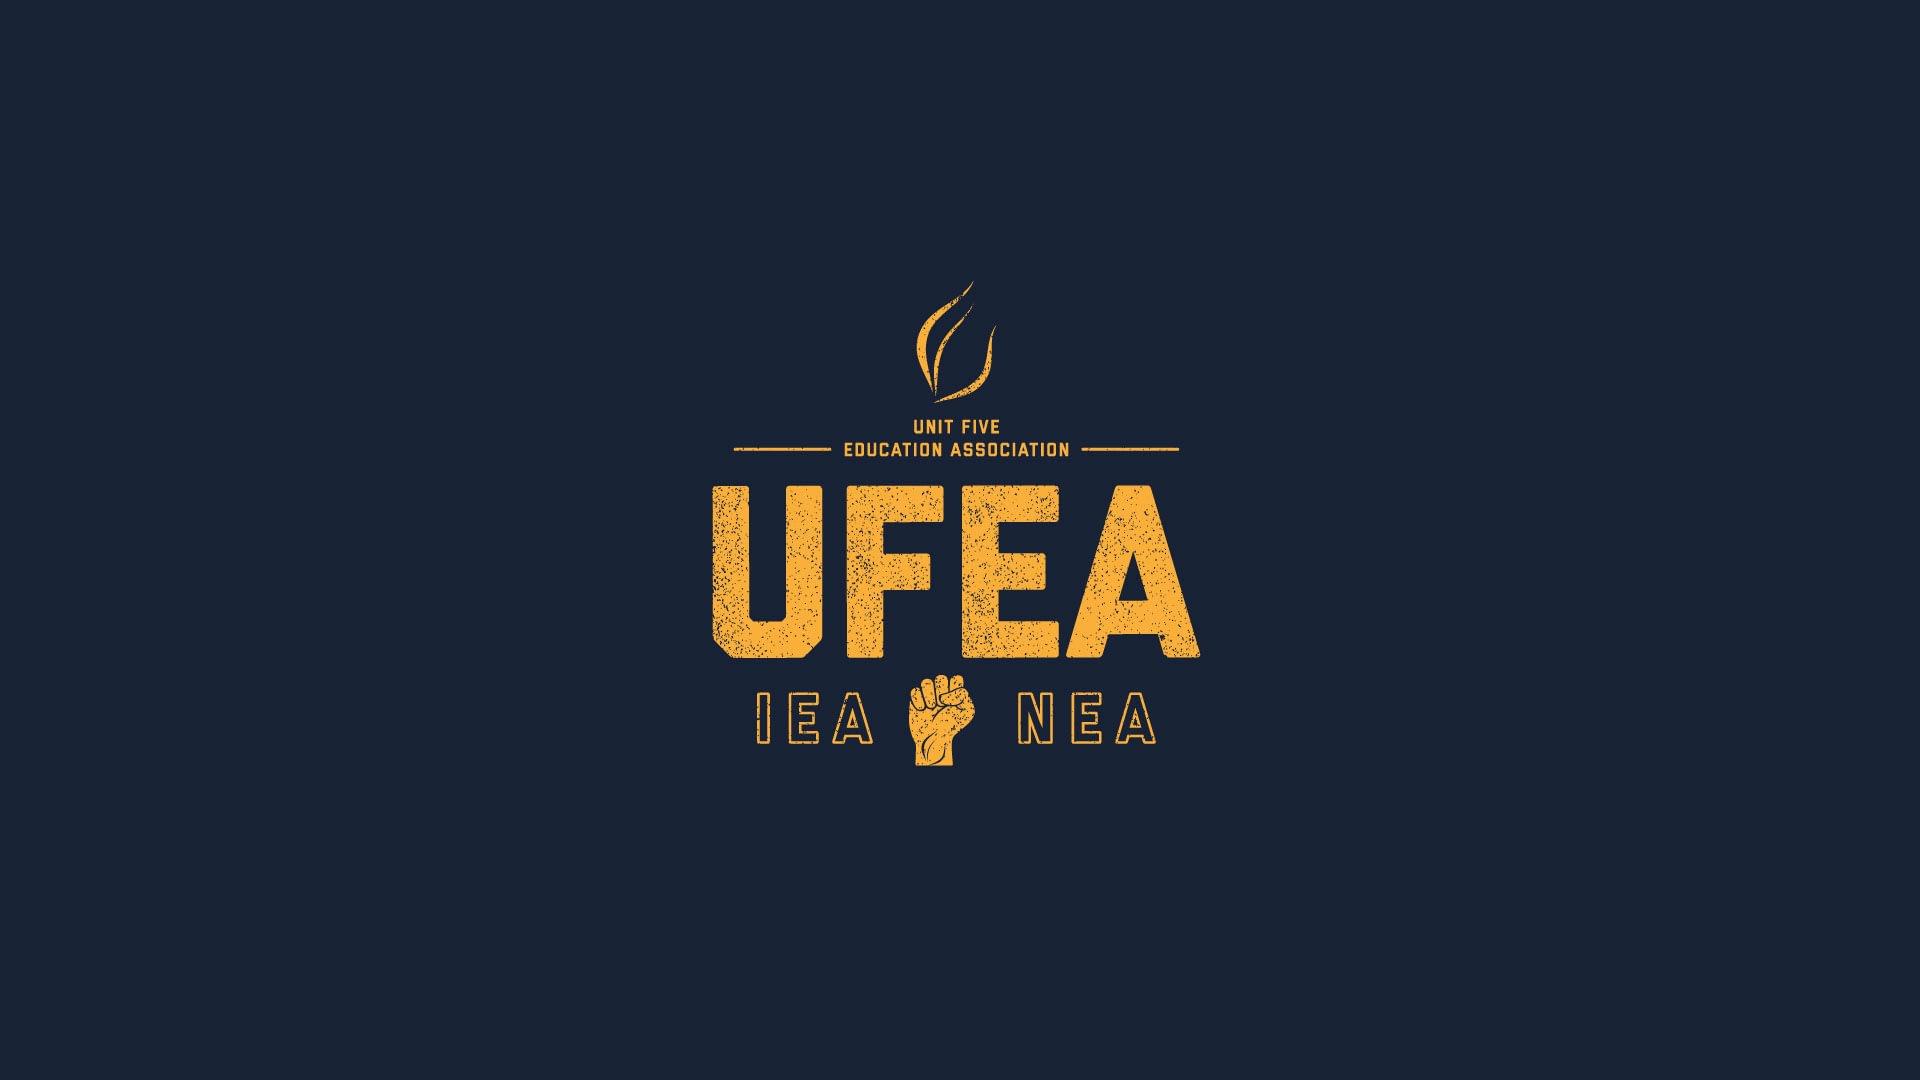 (c) Ufea.org